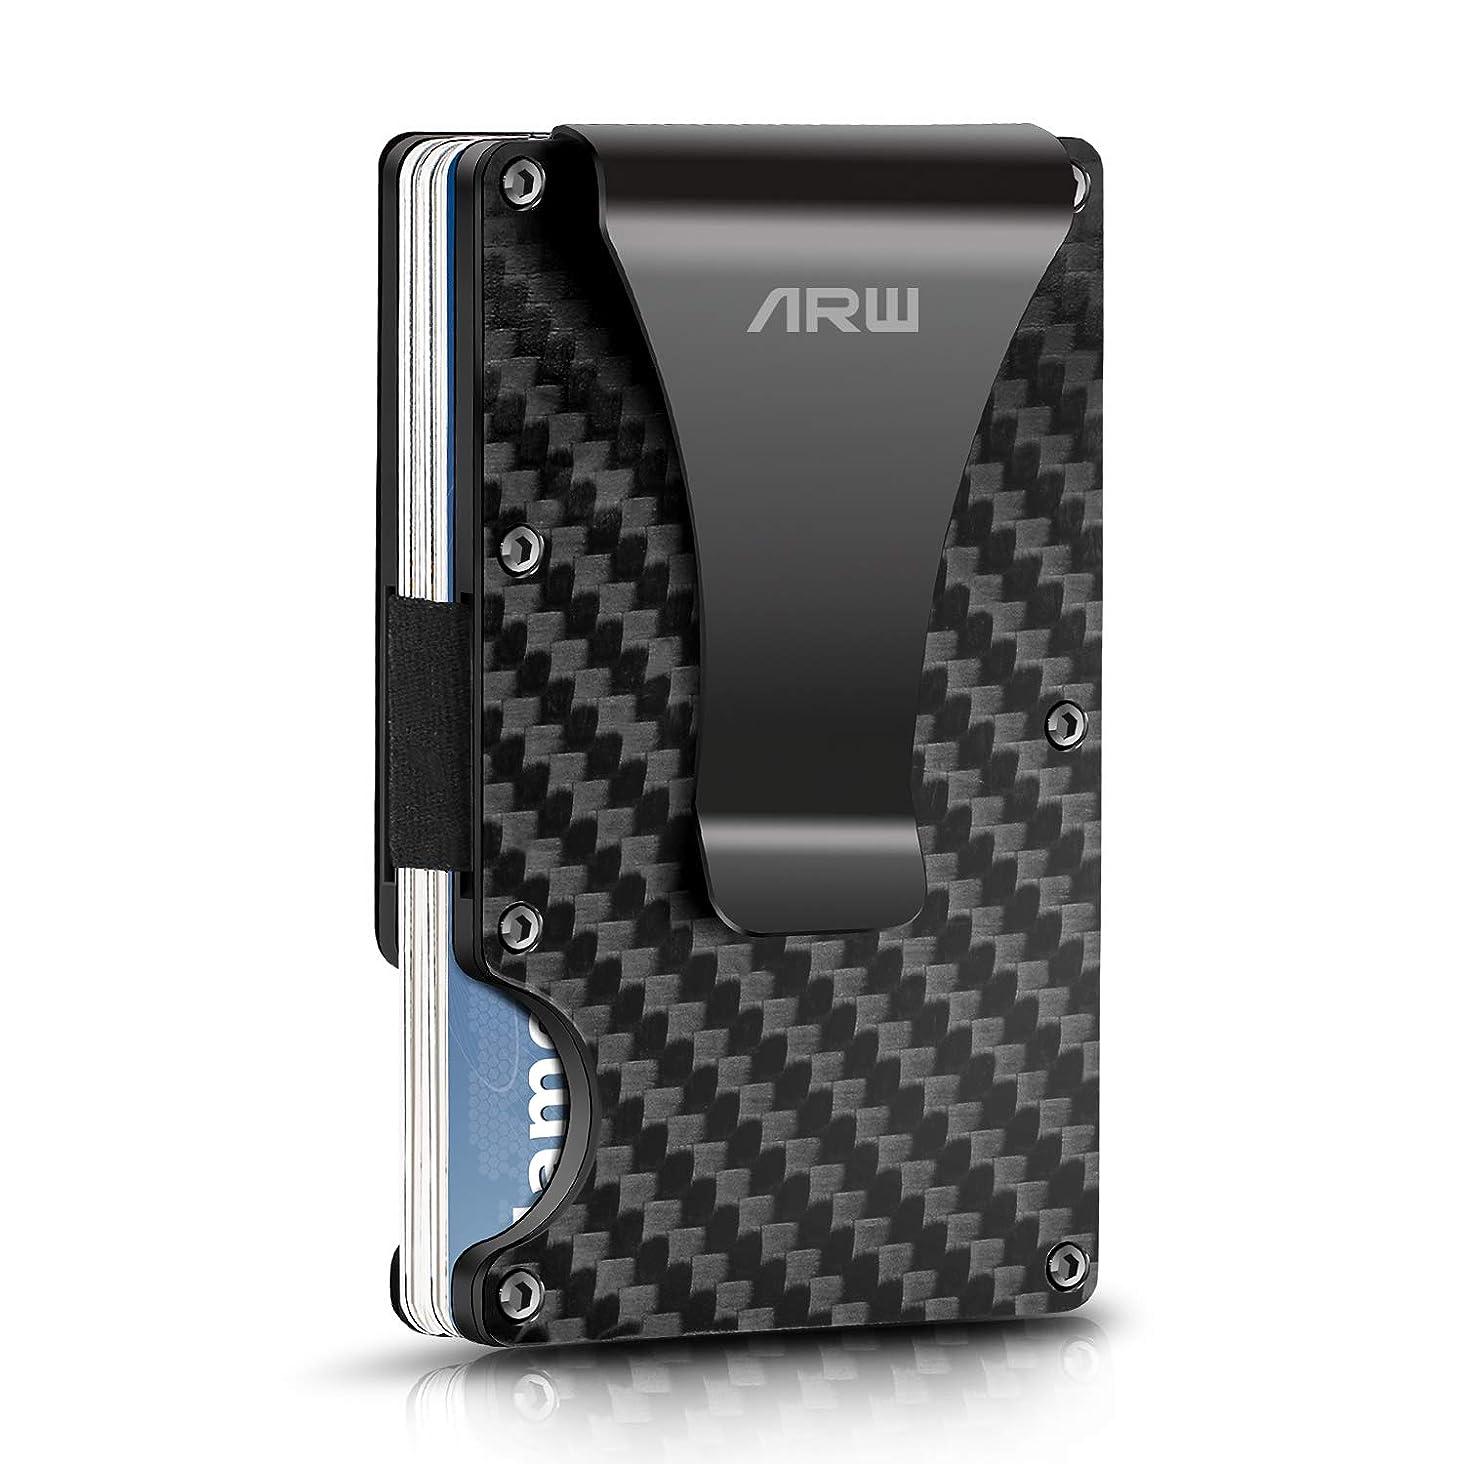 Carbon Fiber Wallet, ARW Metal Money Clip Wallet, RFID Blocking Minimalist Wallet for Men